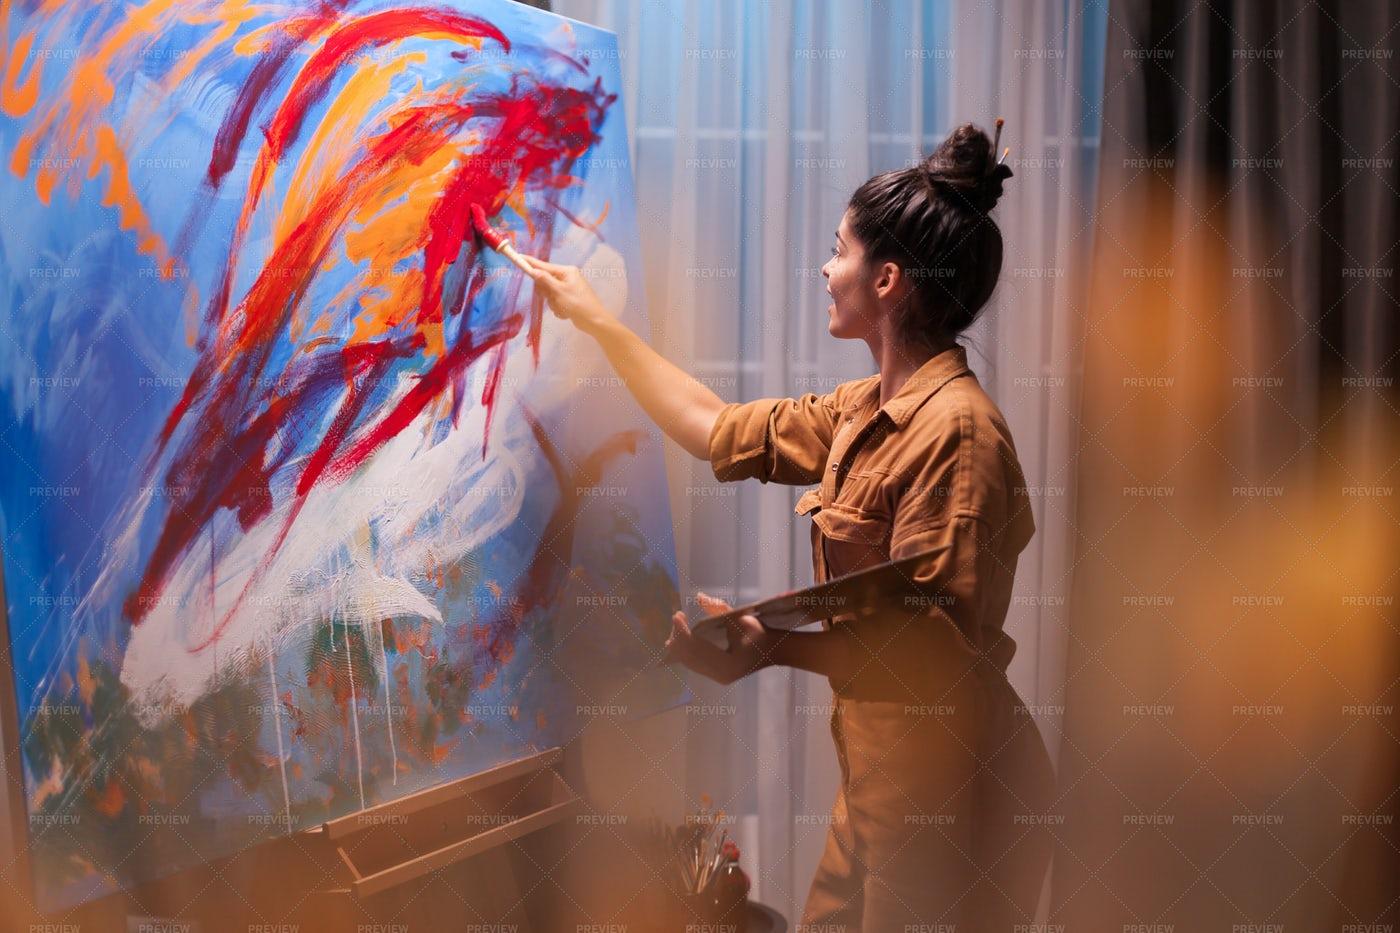 Painting Her Masterpiece: Stock Photos